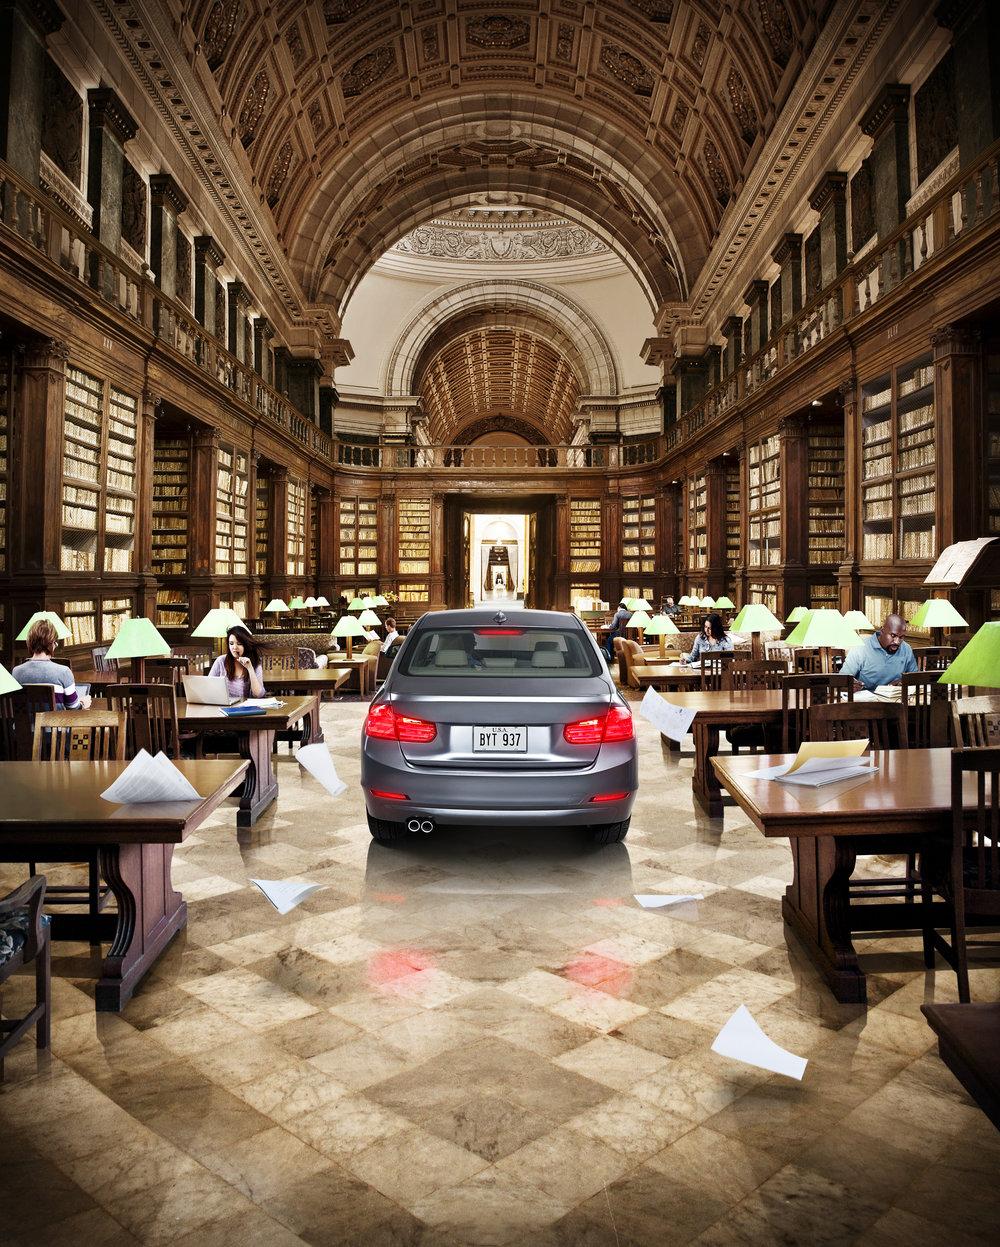 bridgestone_library@465.jpg